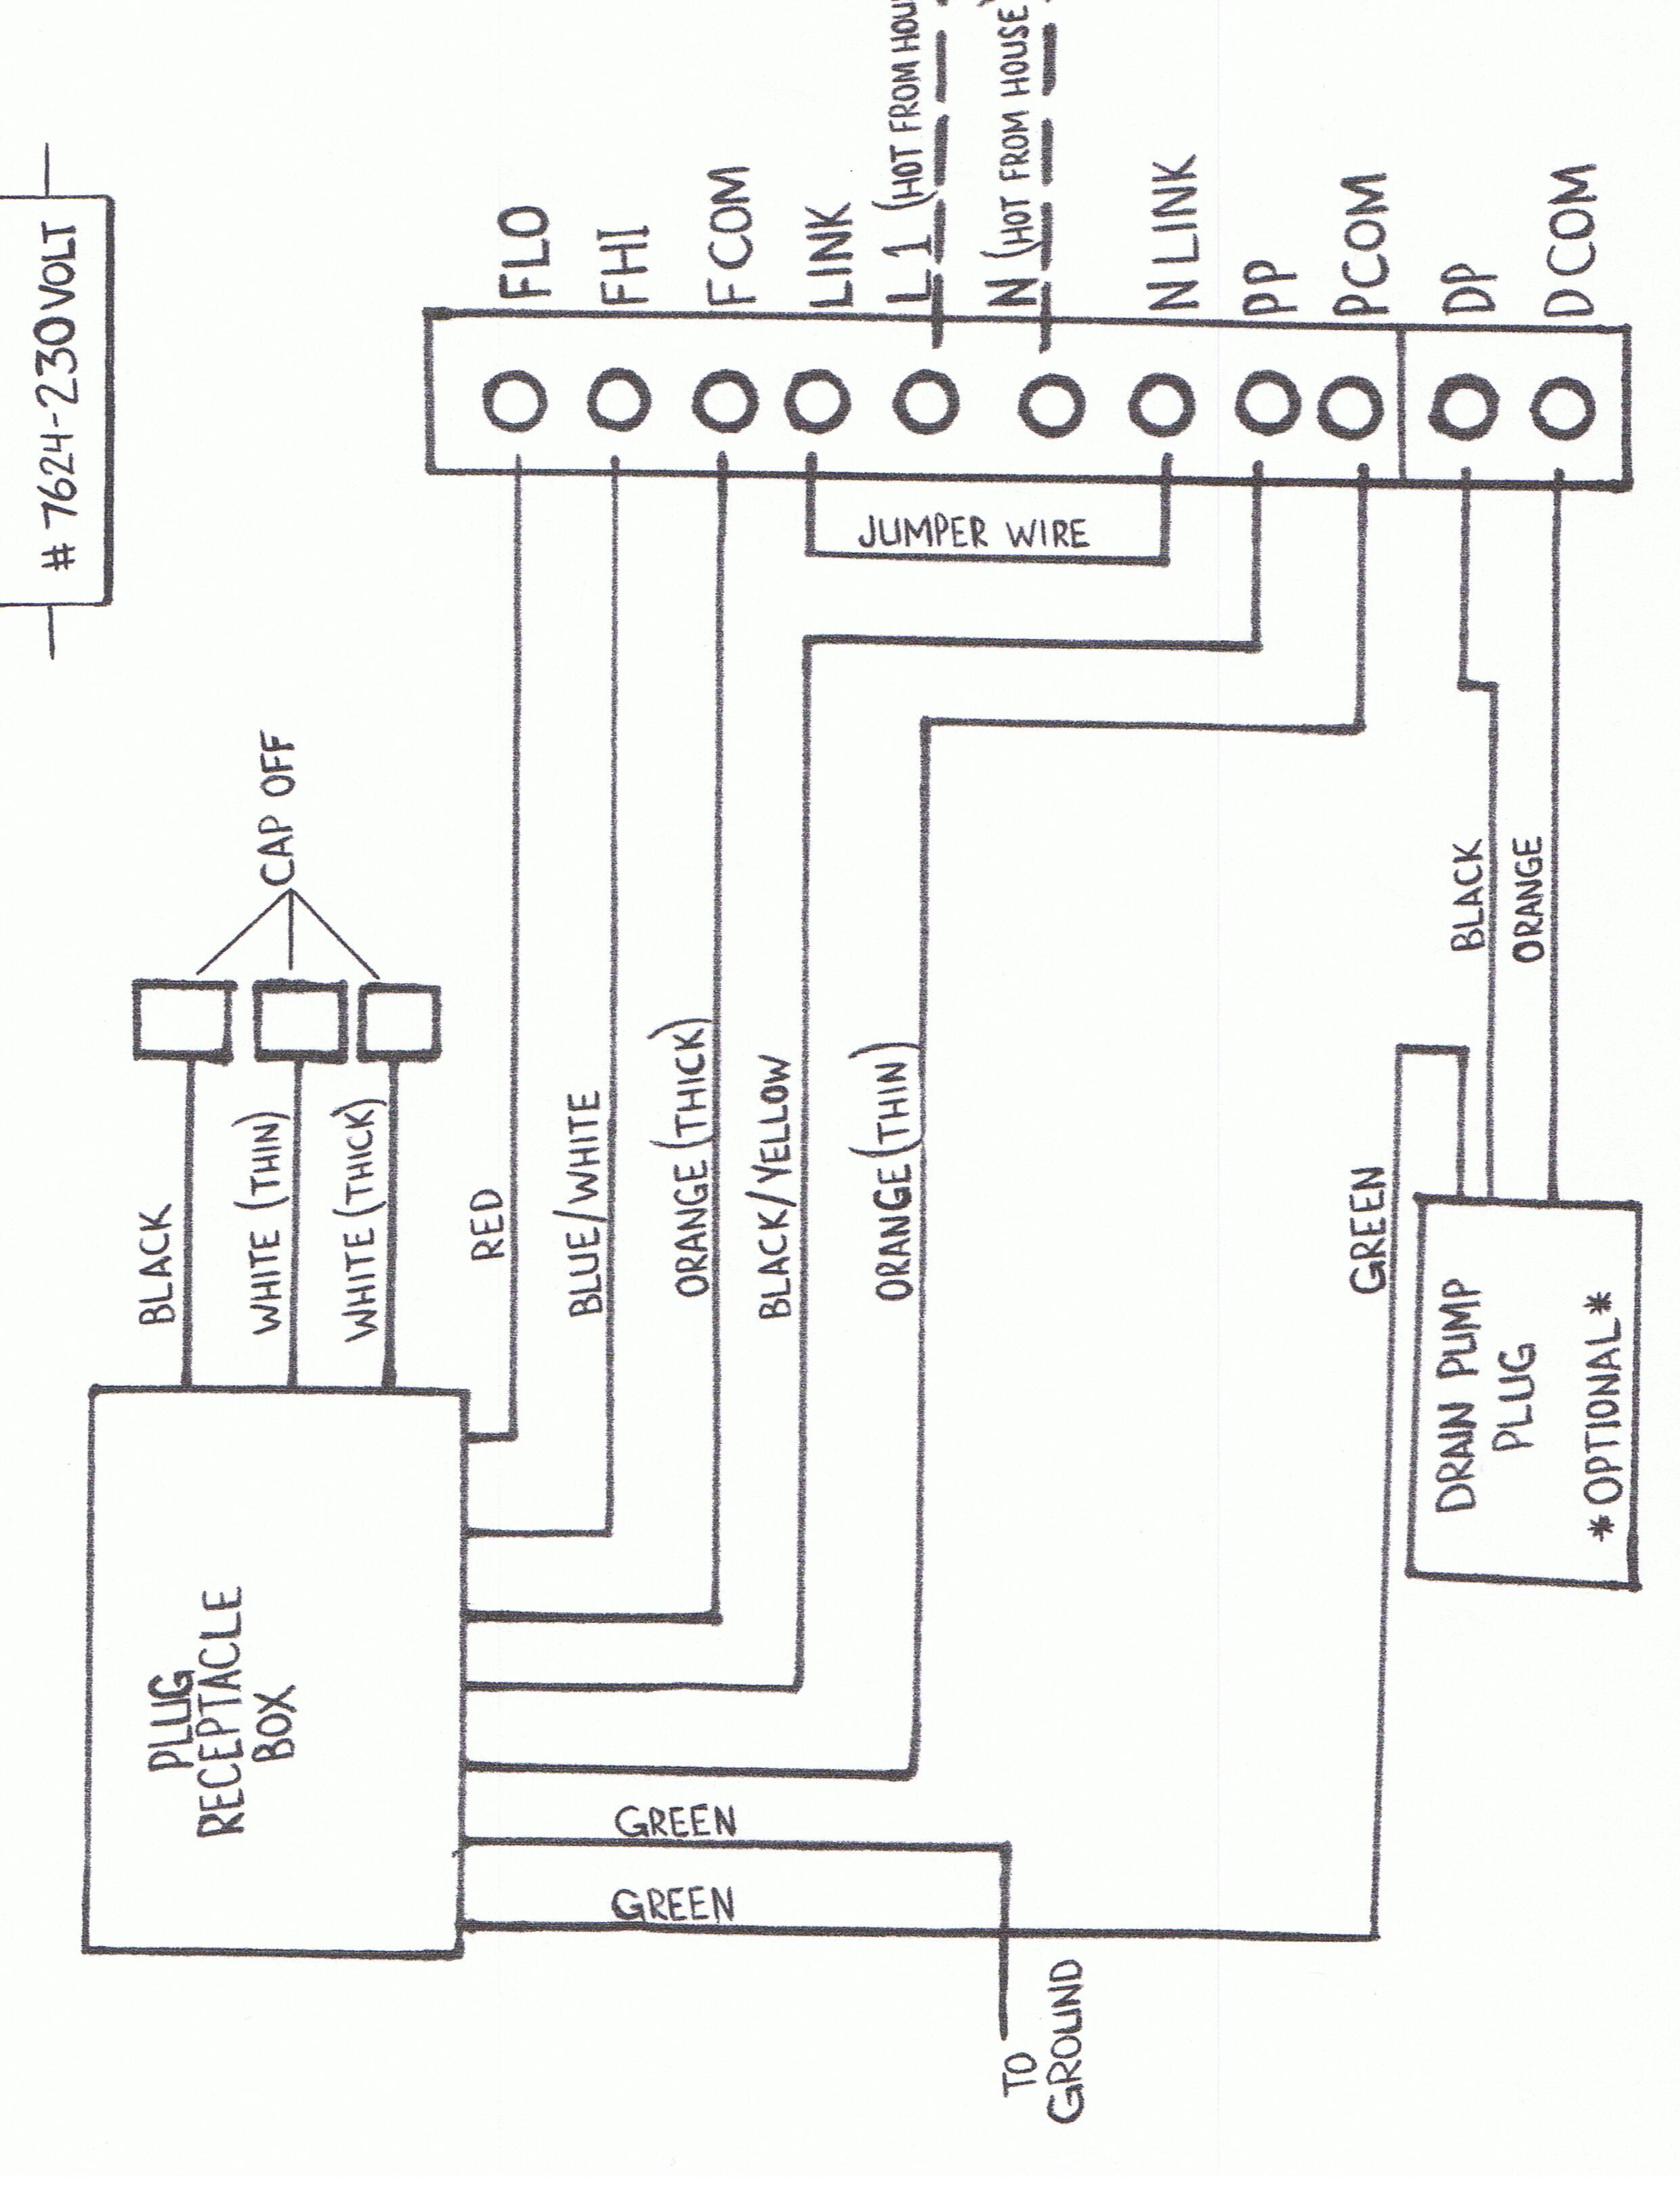 Evaporative Cooler Switch Wiring Diagram